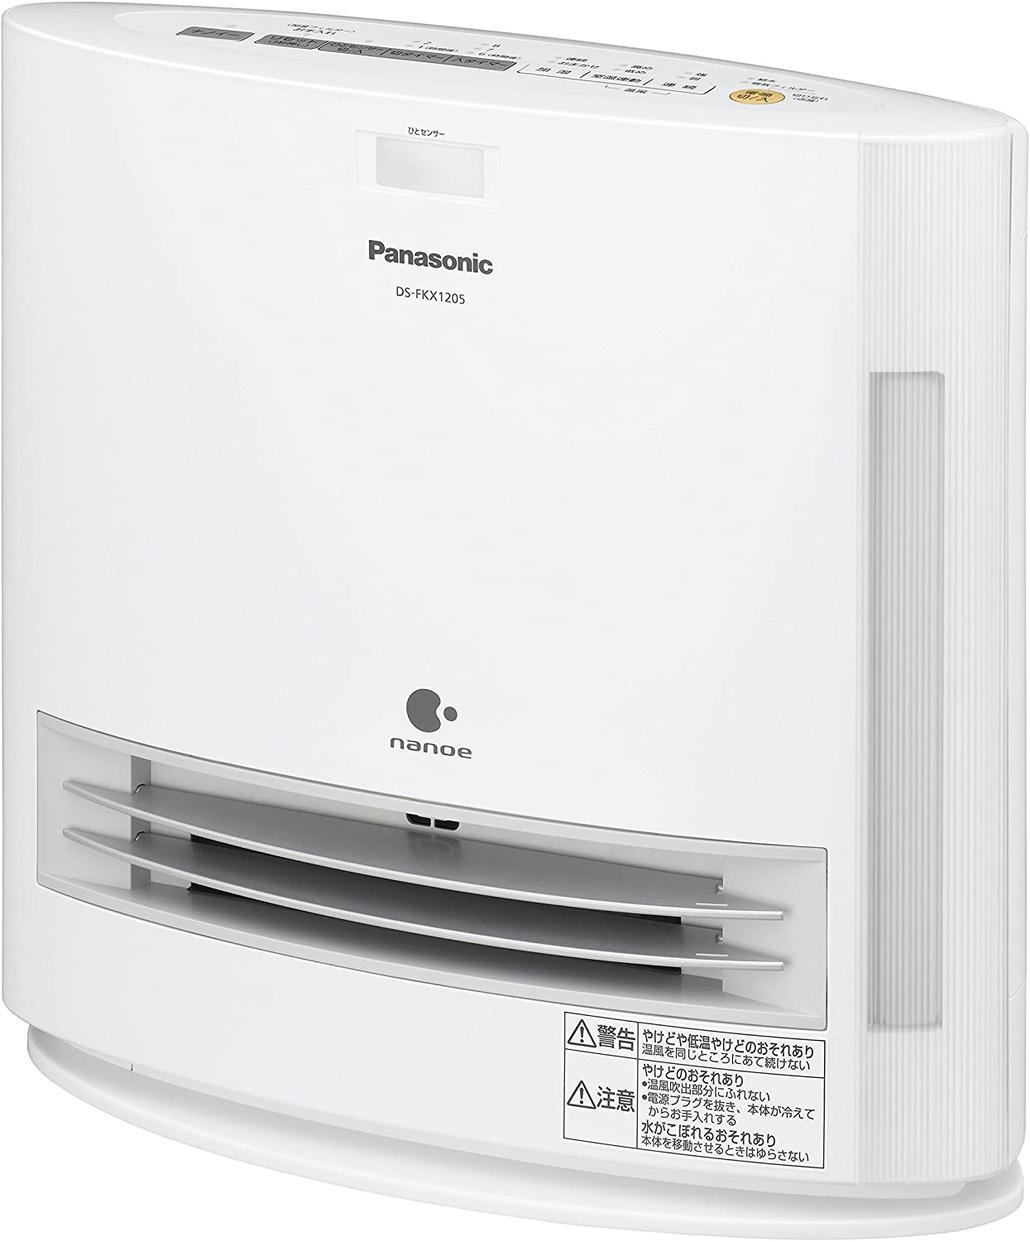 Panasonic(パナソニック) セラミックファンヒーター DS-FKX1205の商品画像